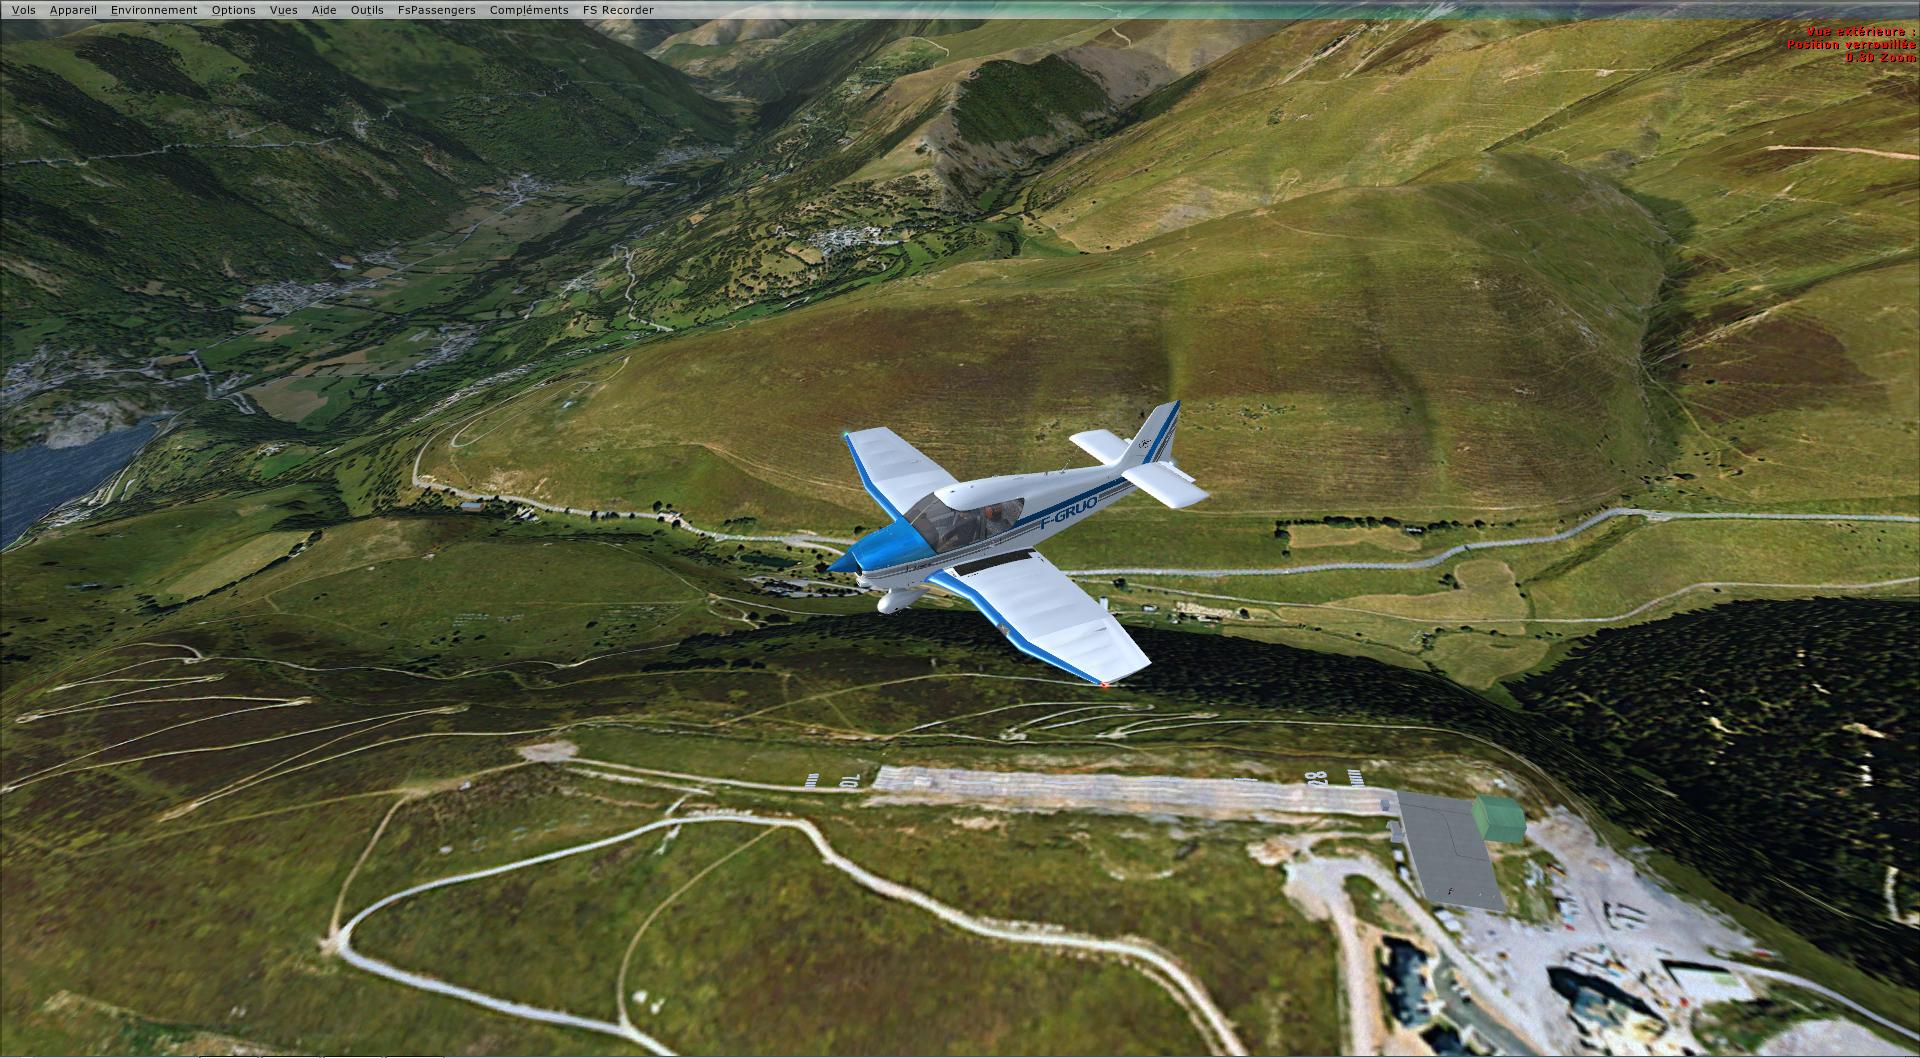 Essai demo X-Plane 10 - Page 2 188376201332418139115